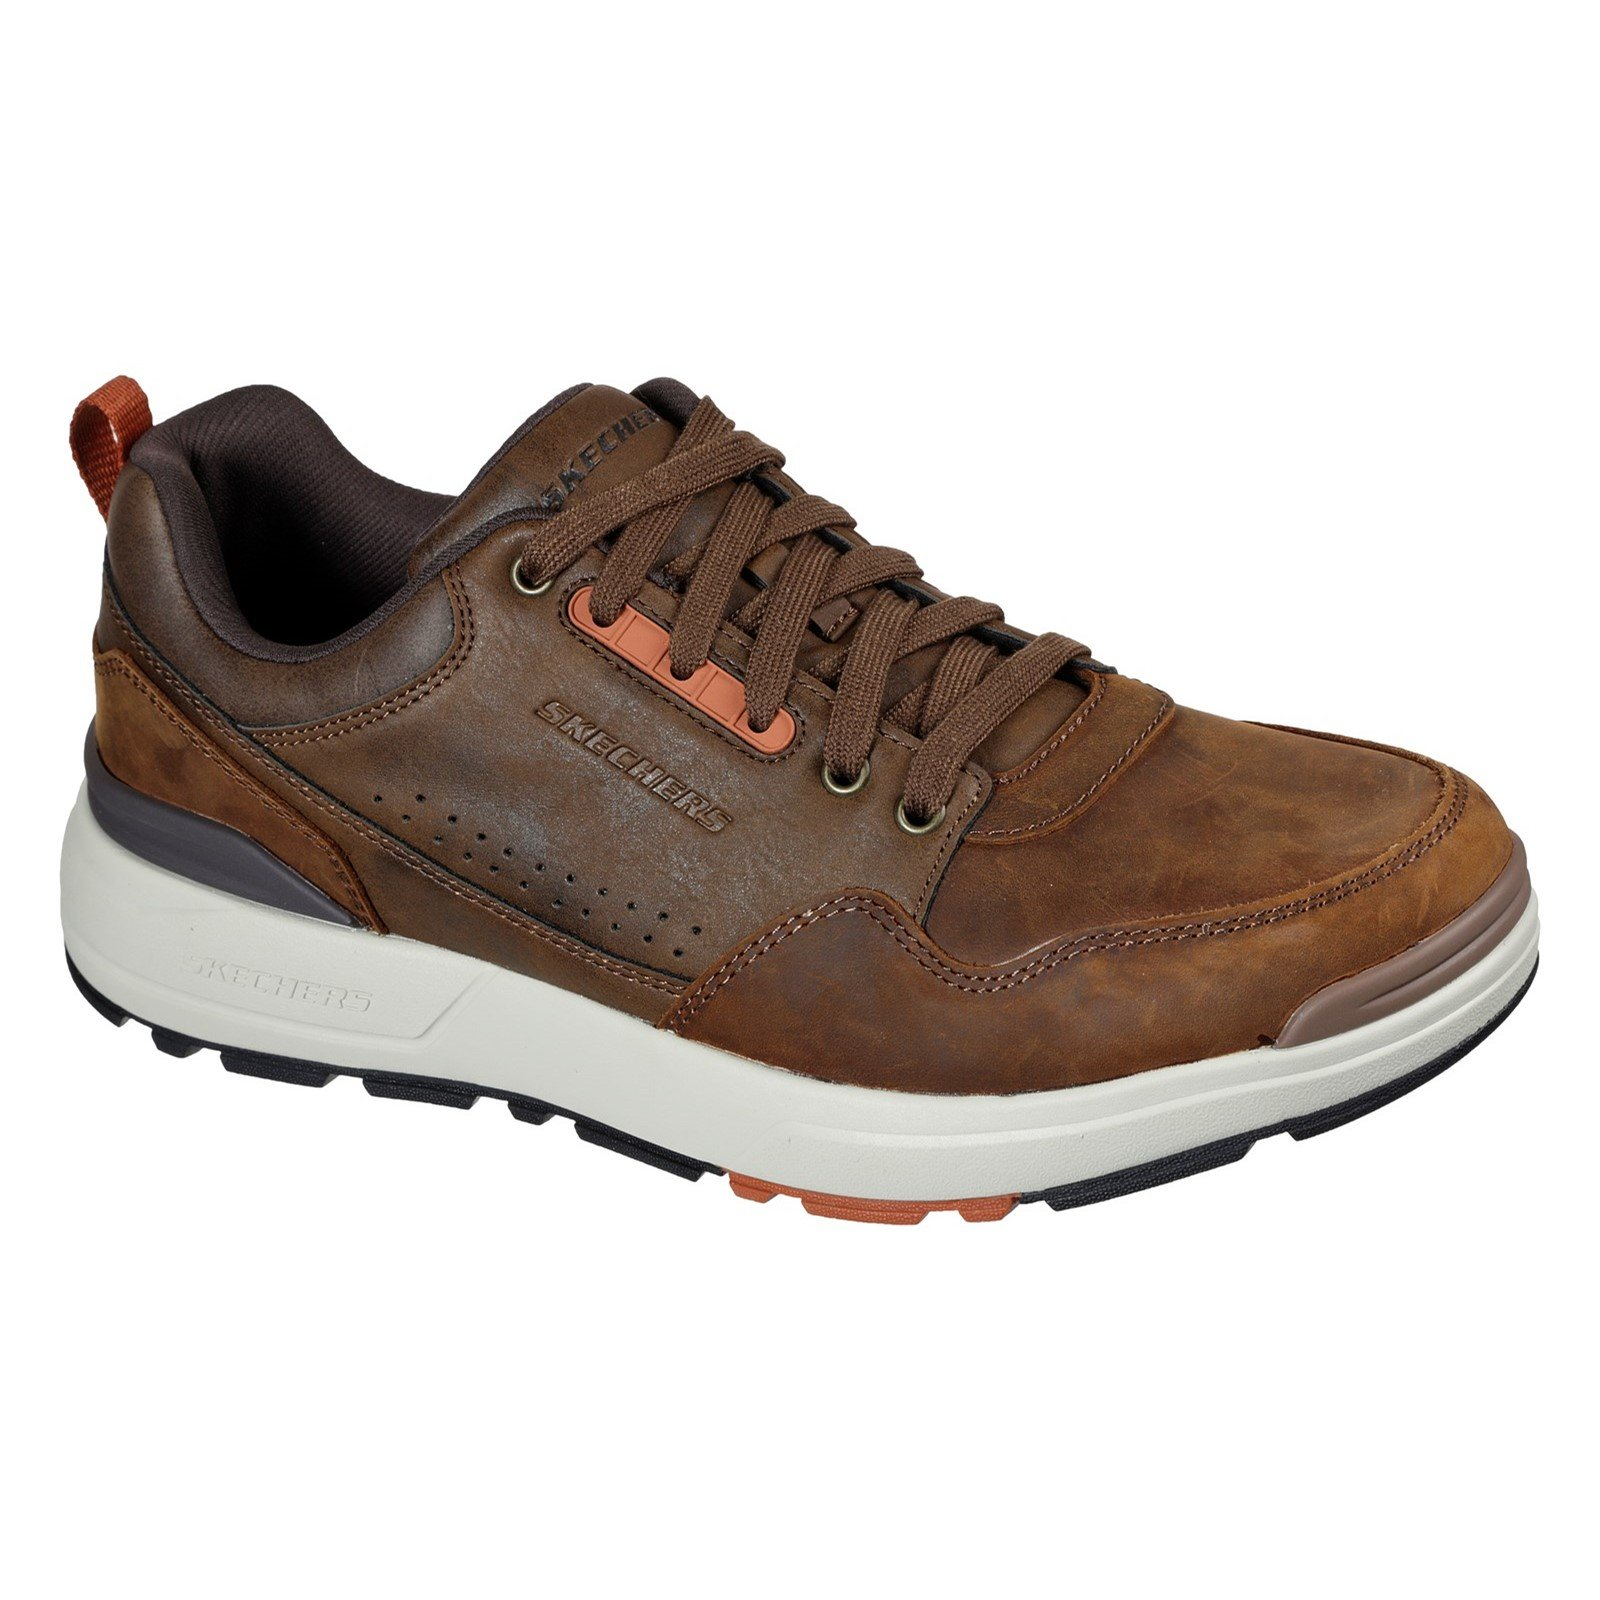 Skechers Men's Rozier Mancer Trainer Multicolor 32450 - Chocolate/Dark Brown 12